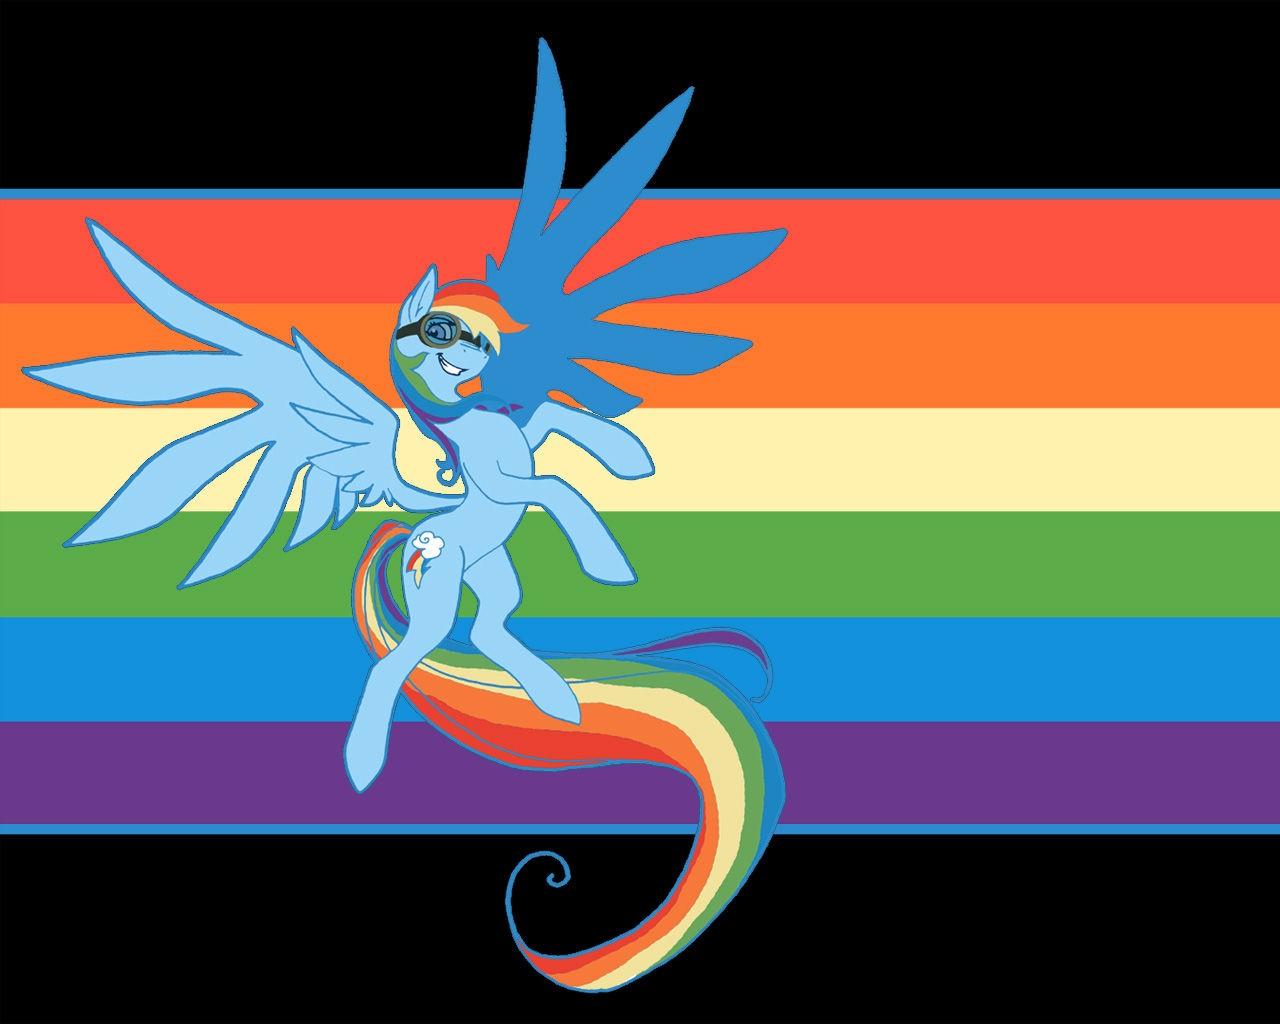 Wallpaper Ilustrasi Gambar Kartun Naga My Little Pony Rainbow Dash Screenshot Karakter Fiksi Fon Makhluk Mitos 1280x1024 Kingbailey 169121 Hd Wallpapers Wallhere